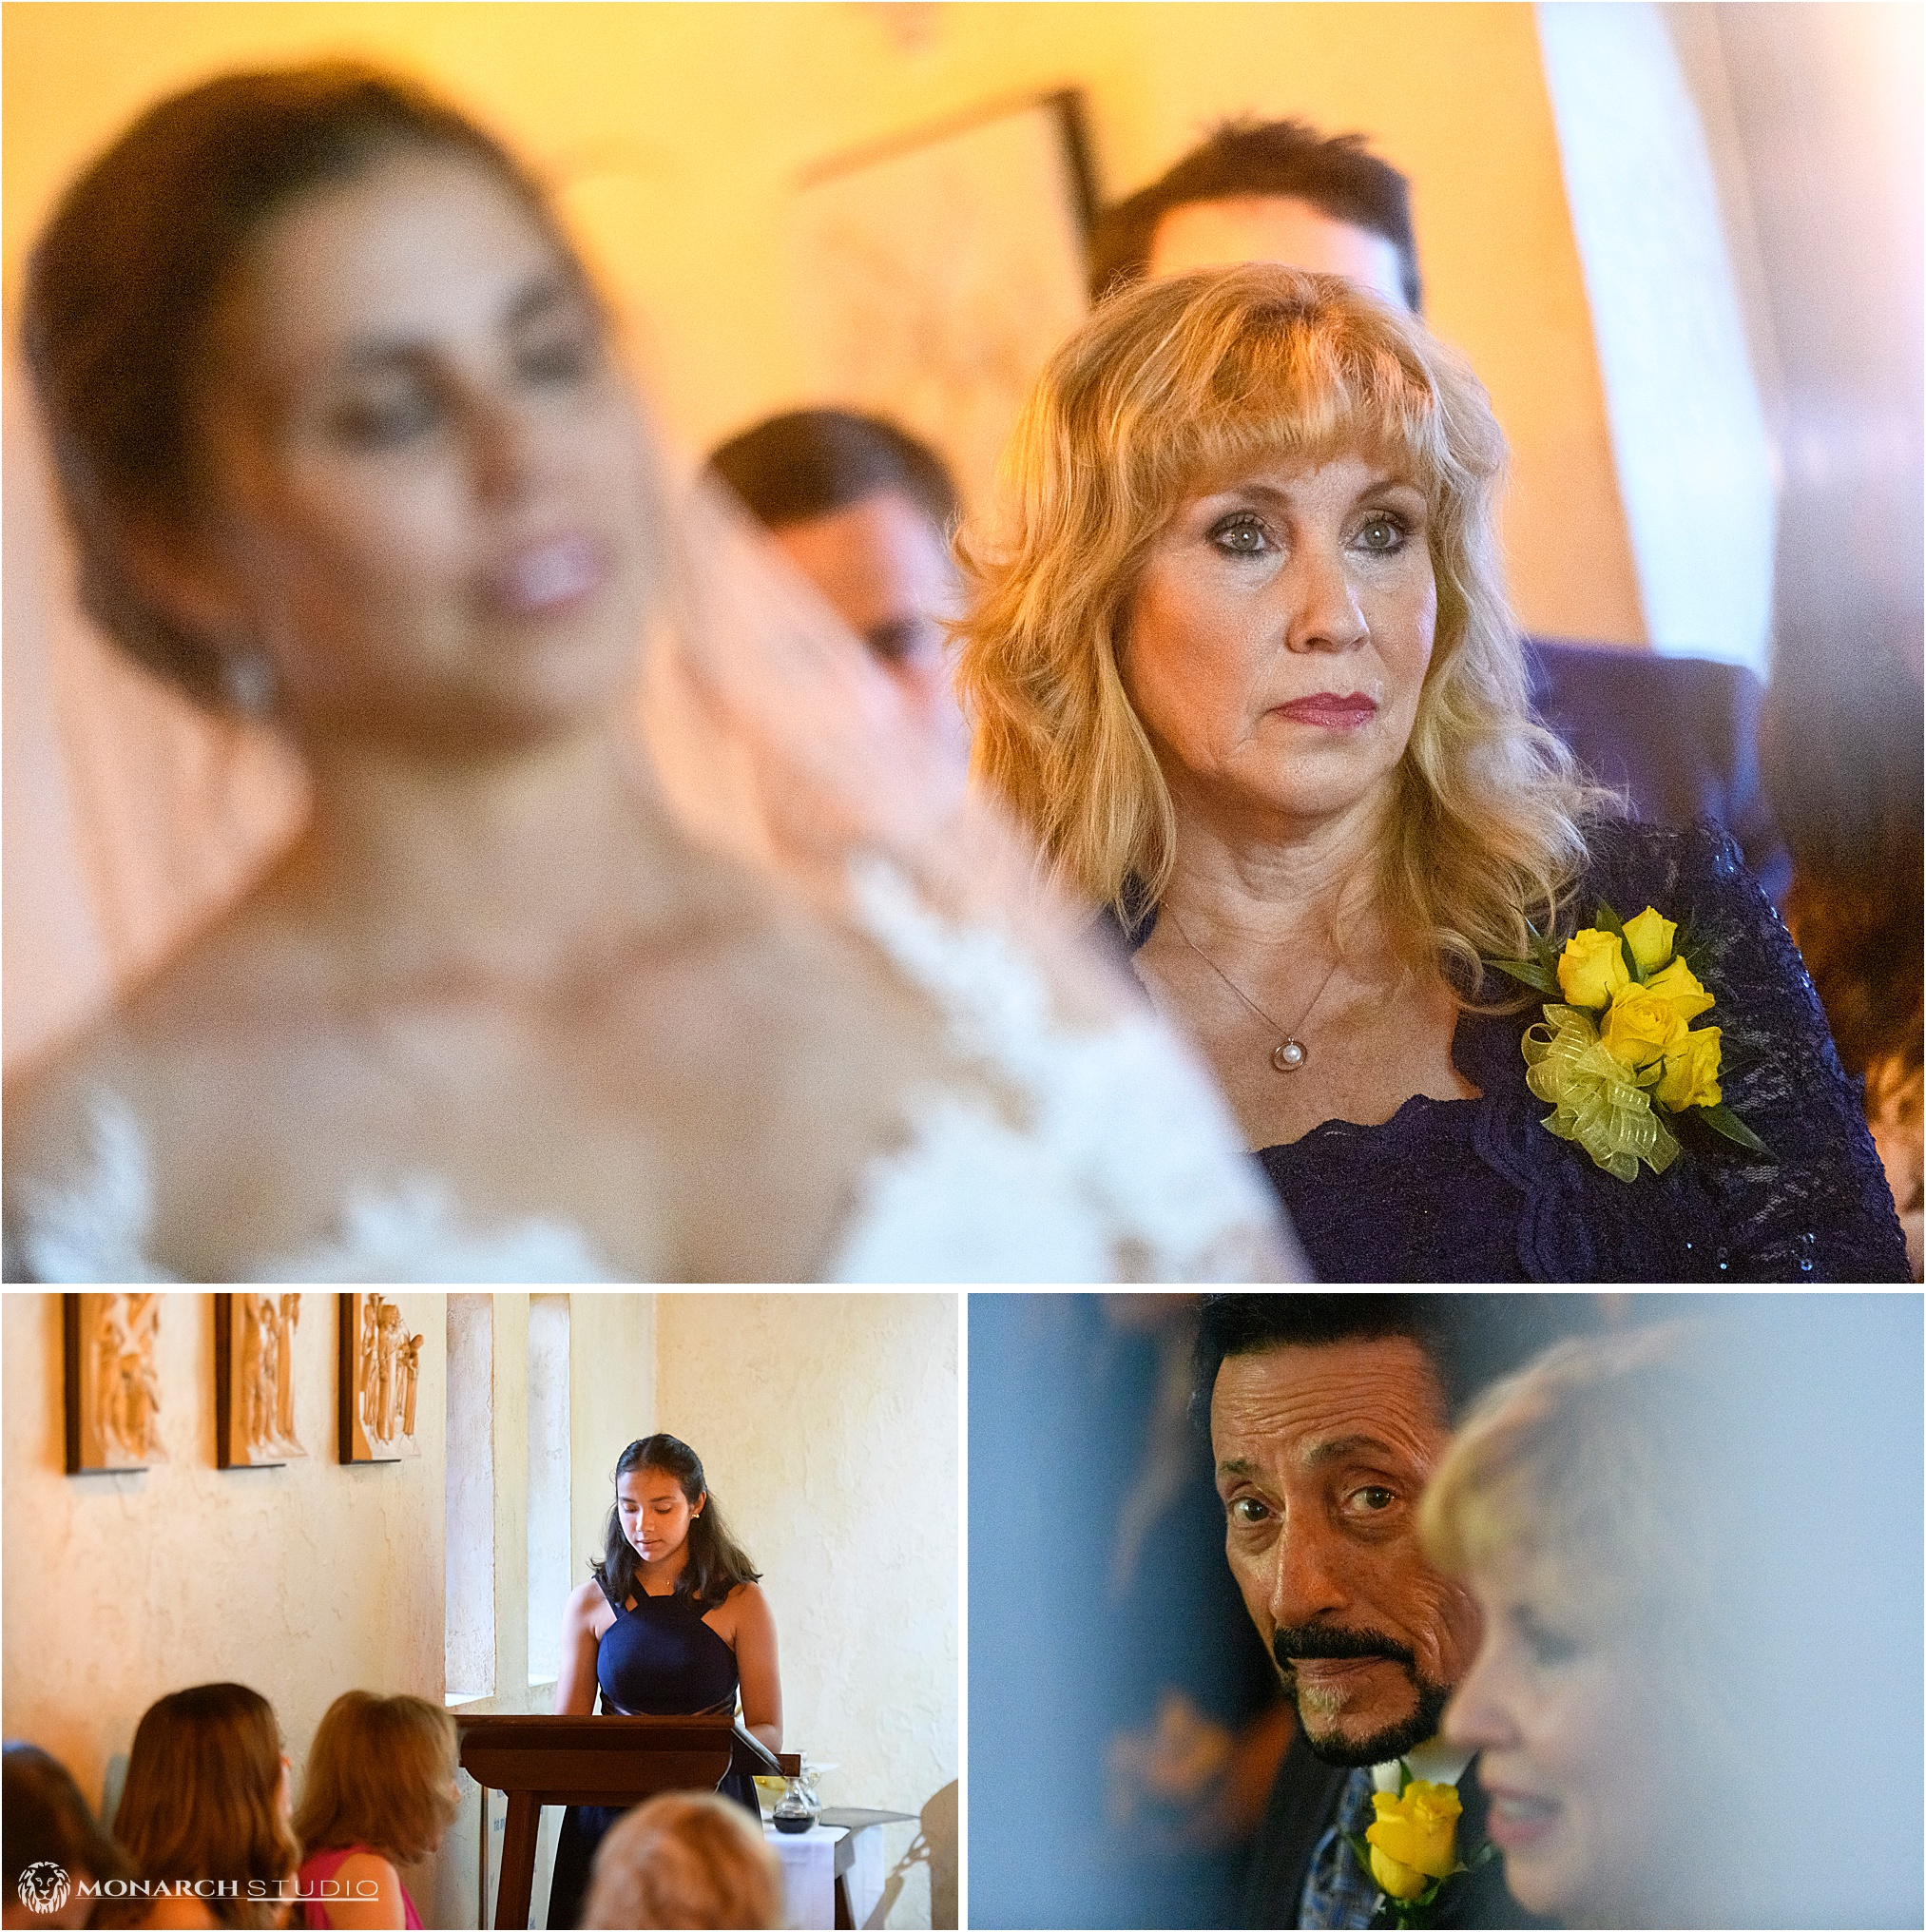 st-augustine-catholic-wedding-044.jpg